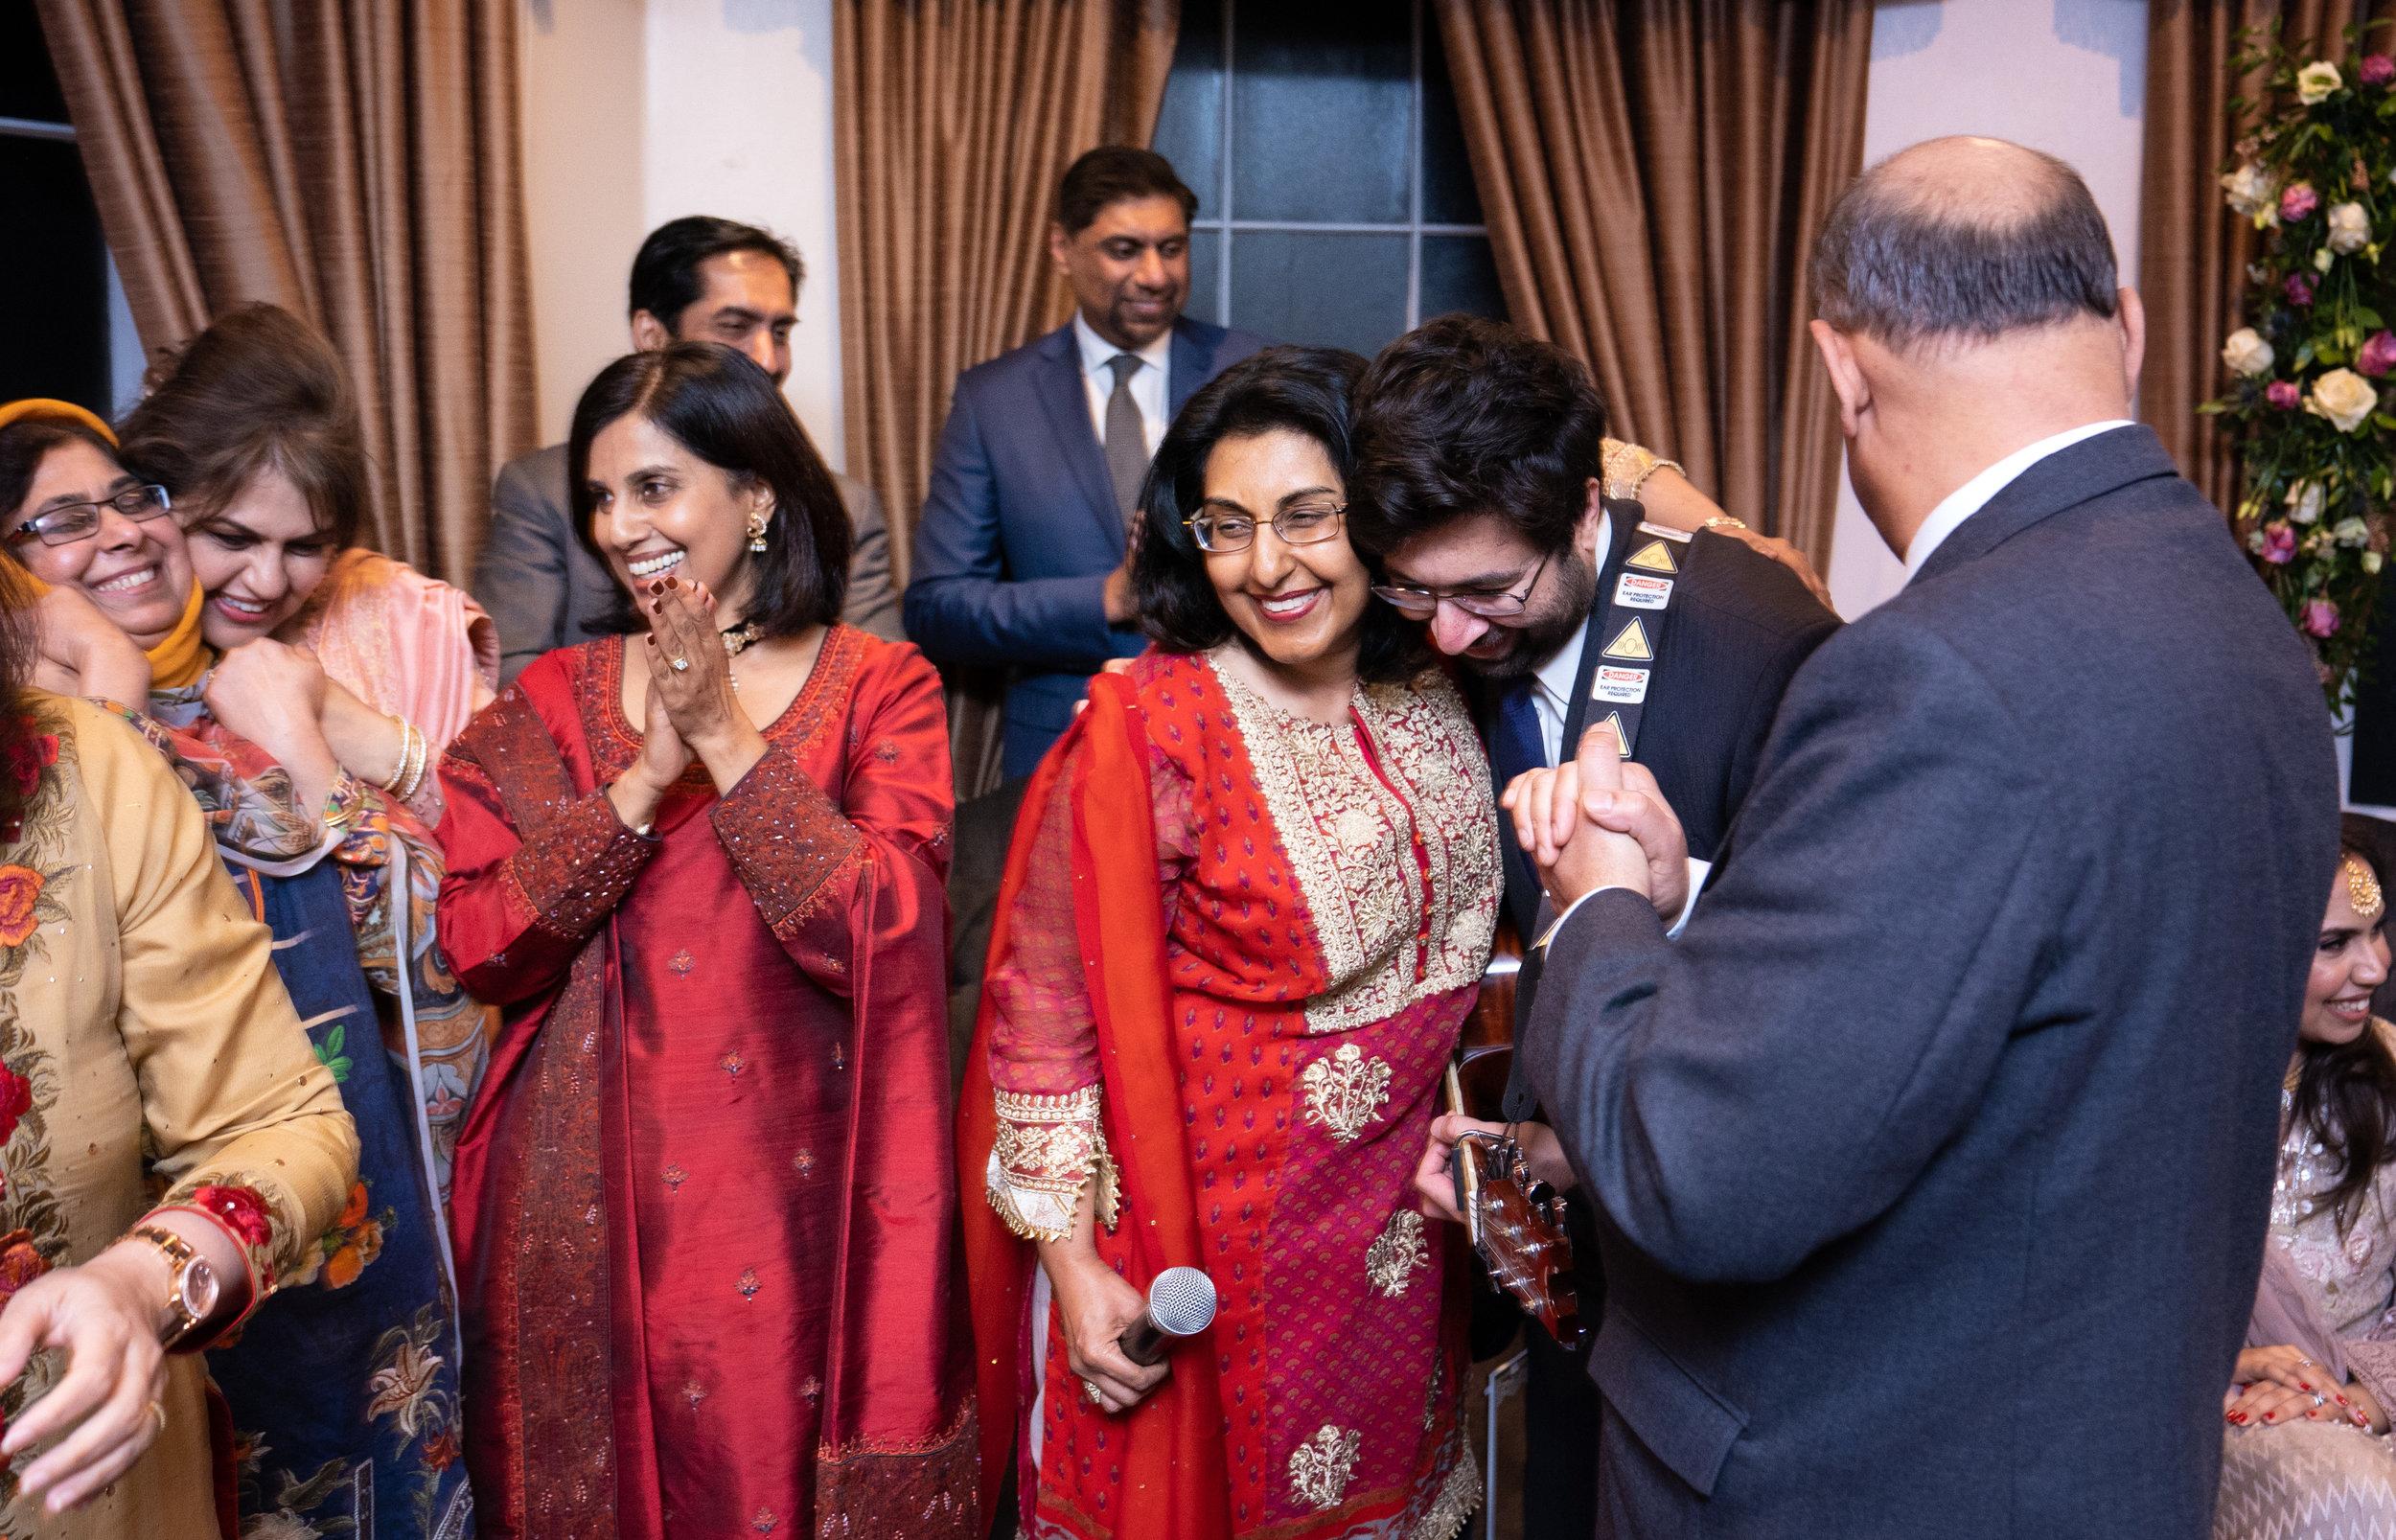 buckinghamshire-golf-club-winter-muslim-wedding-engagement-photography-videography-54